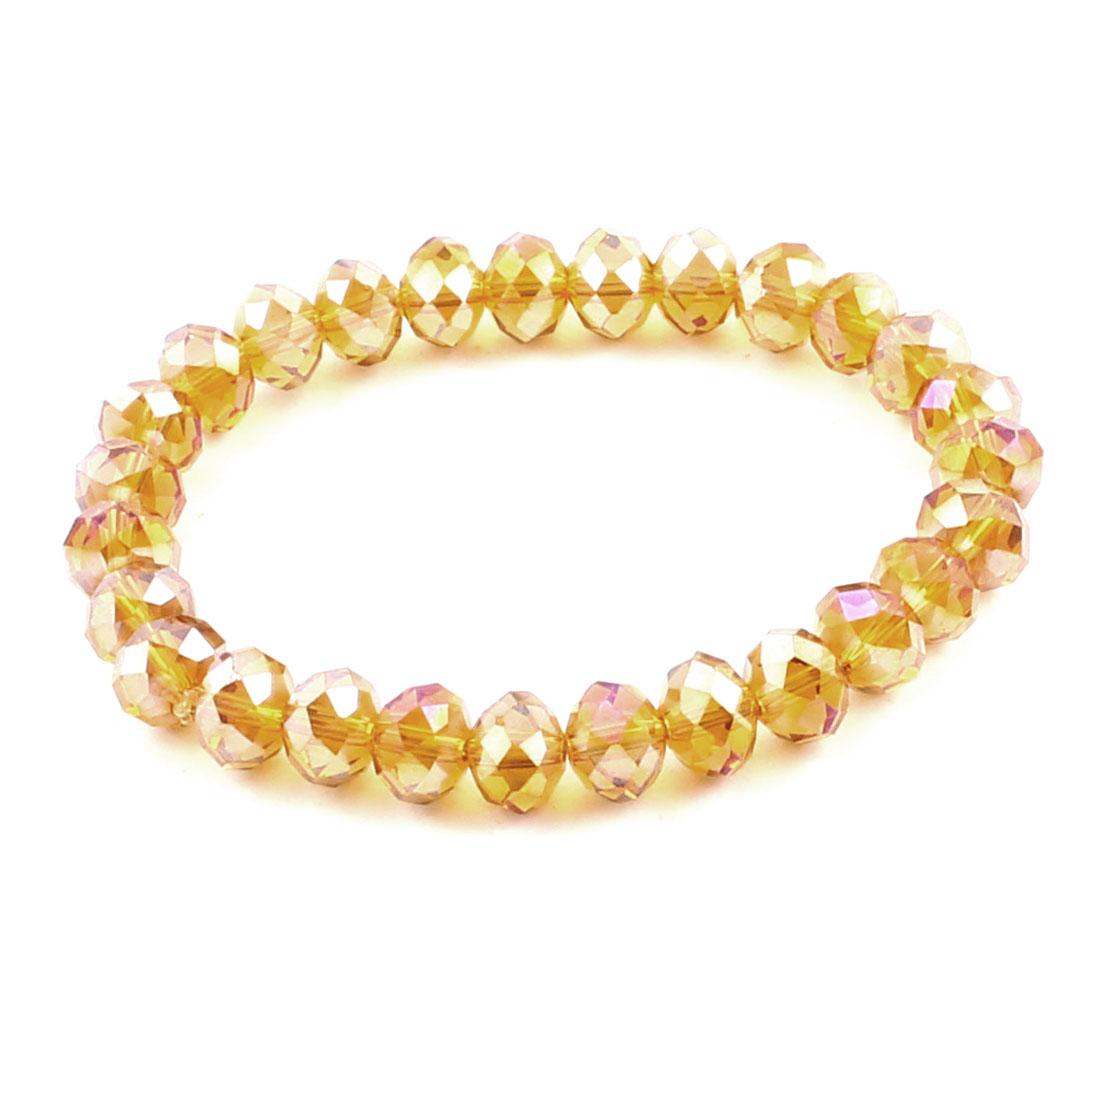 Women Ladies Party Faux Crystal Stretchy Chain Wrist Bracelet Clear Orange